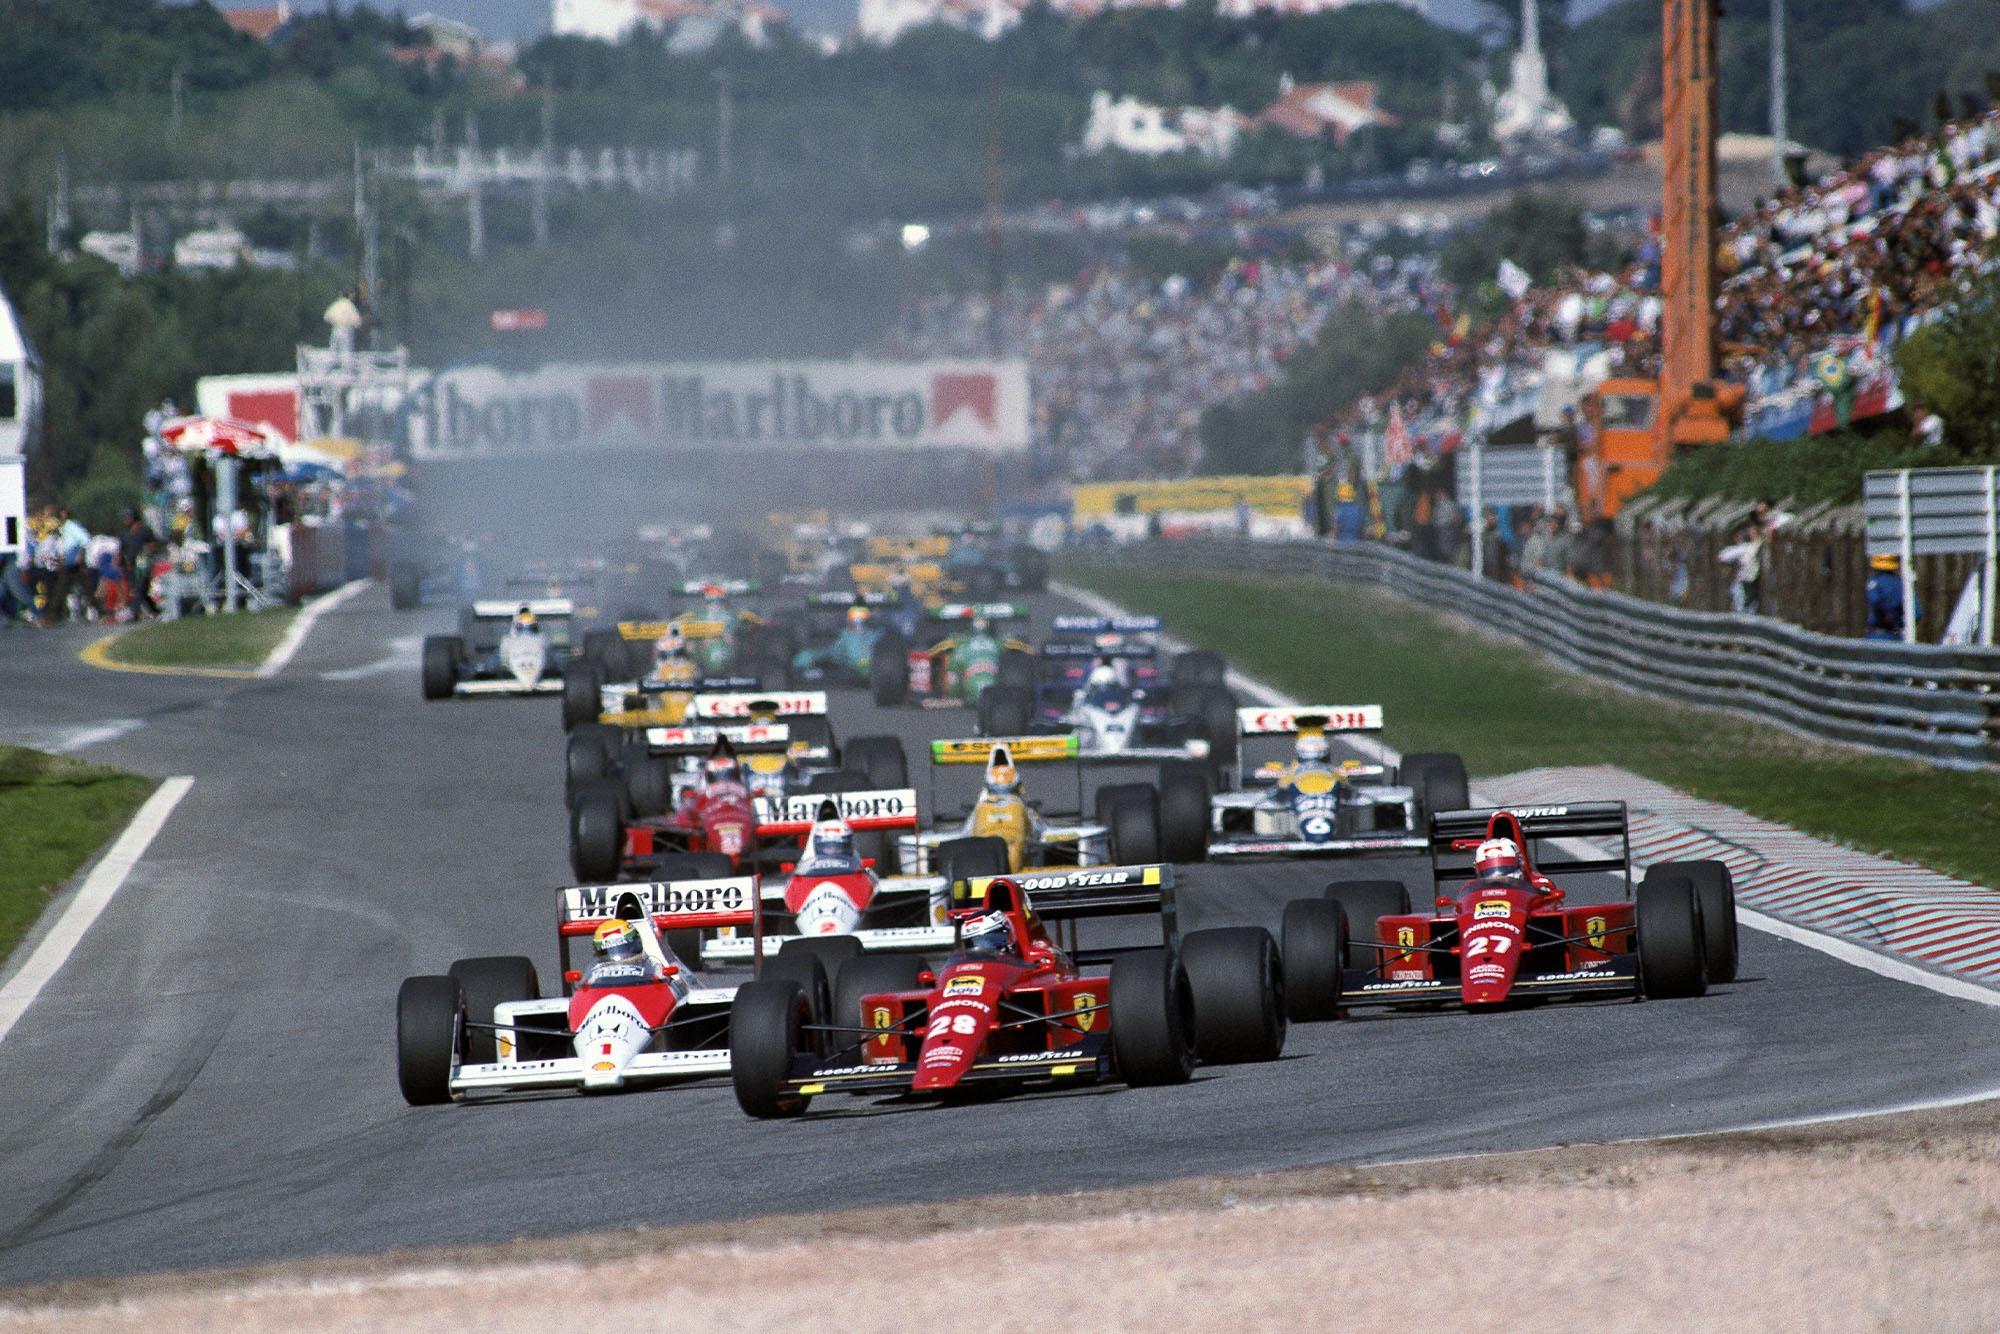 1989 POR GP start